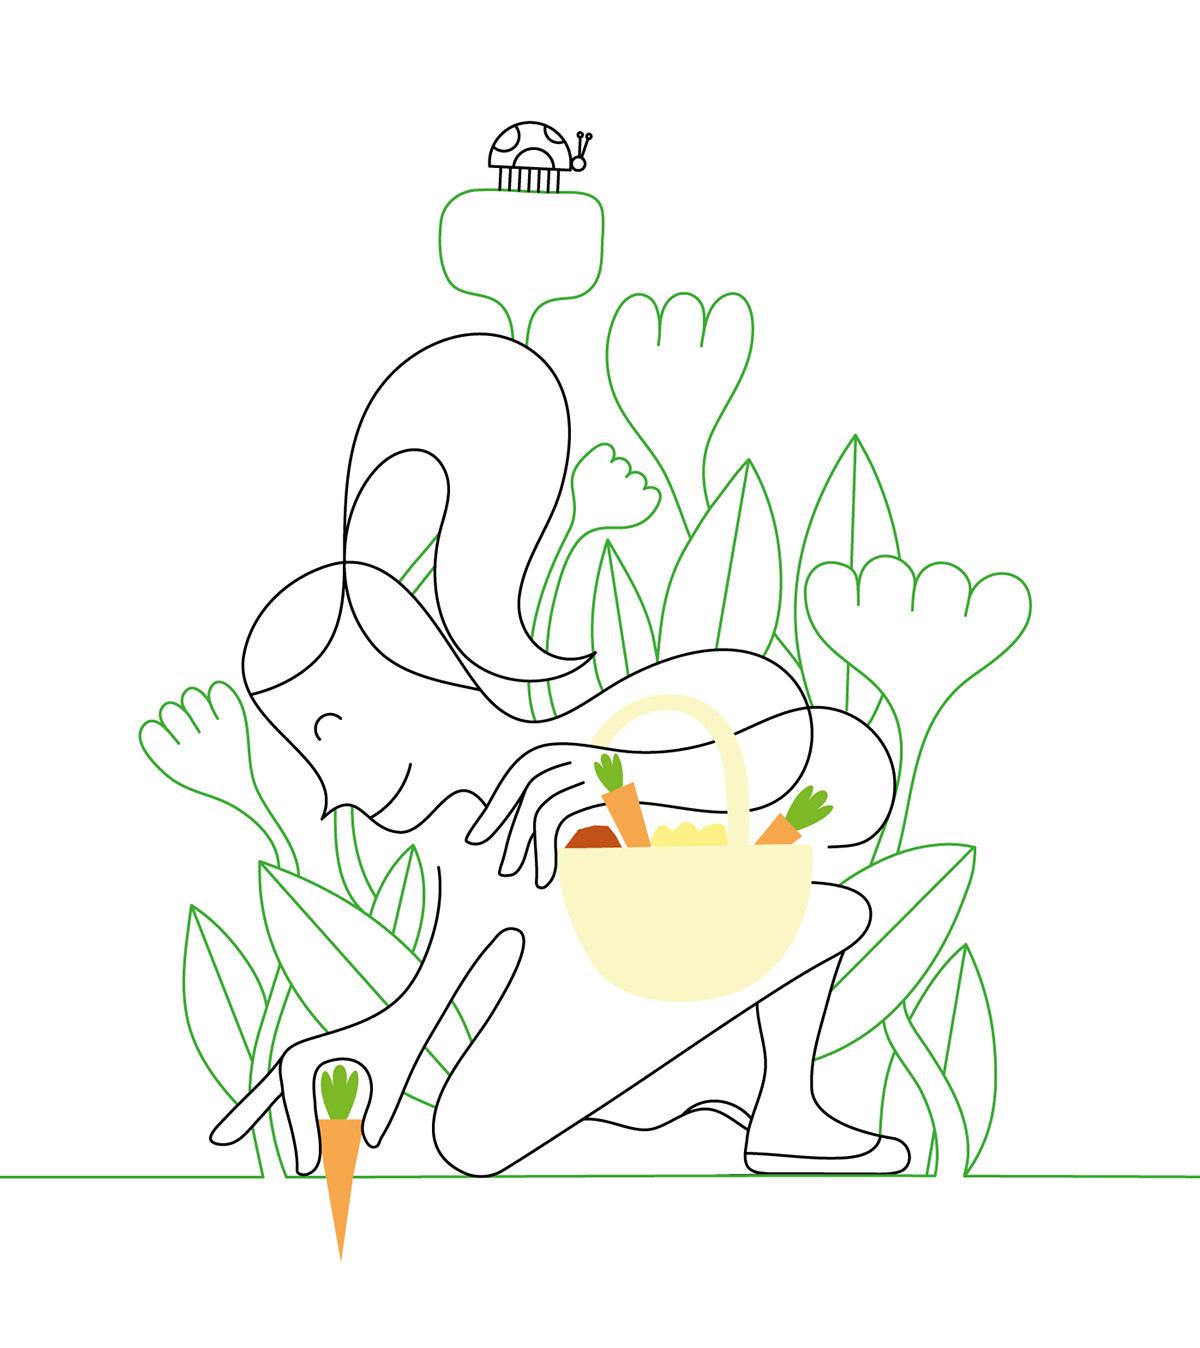 connection natura plants creative oneline minimal design Love heart Pack